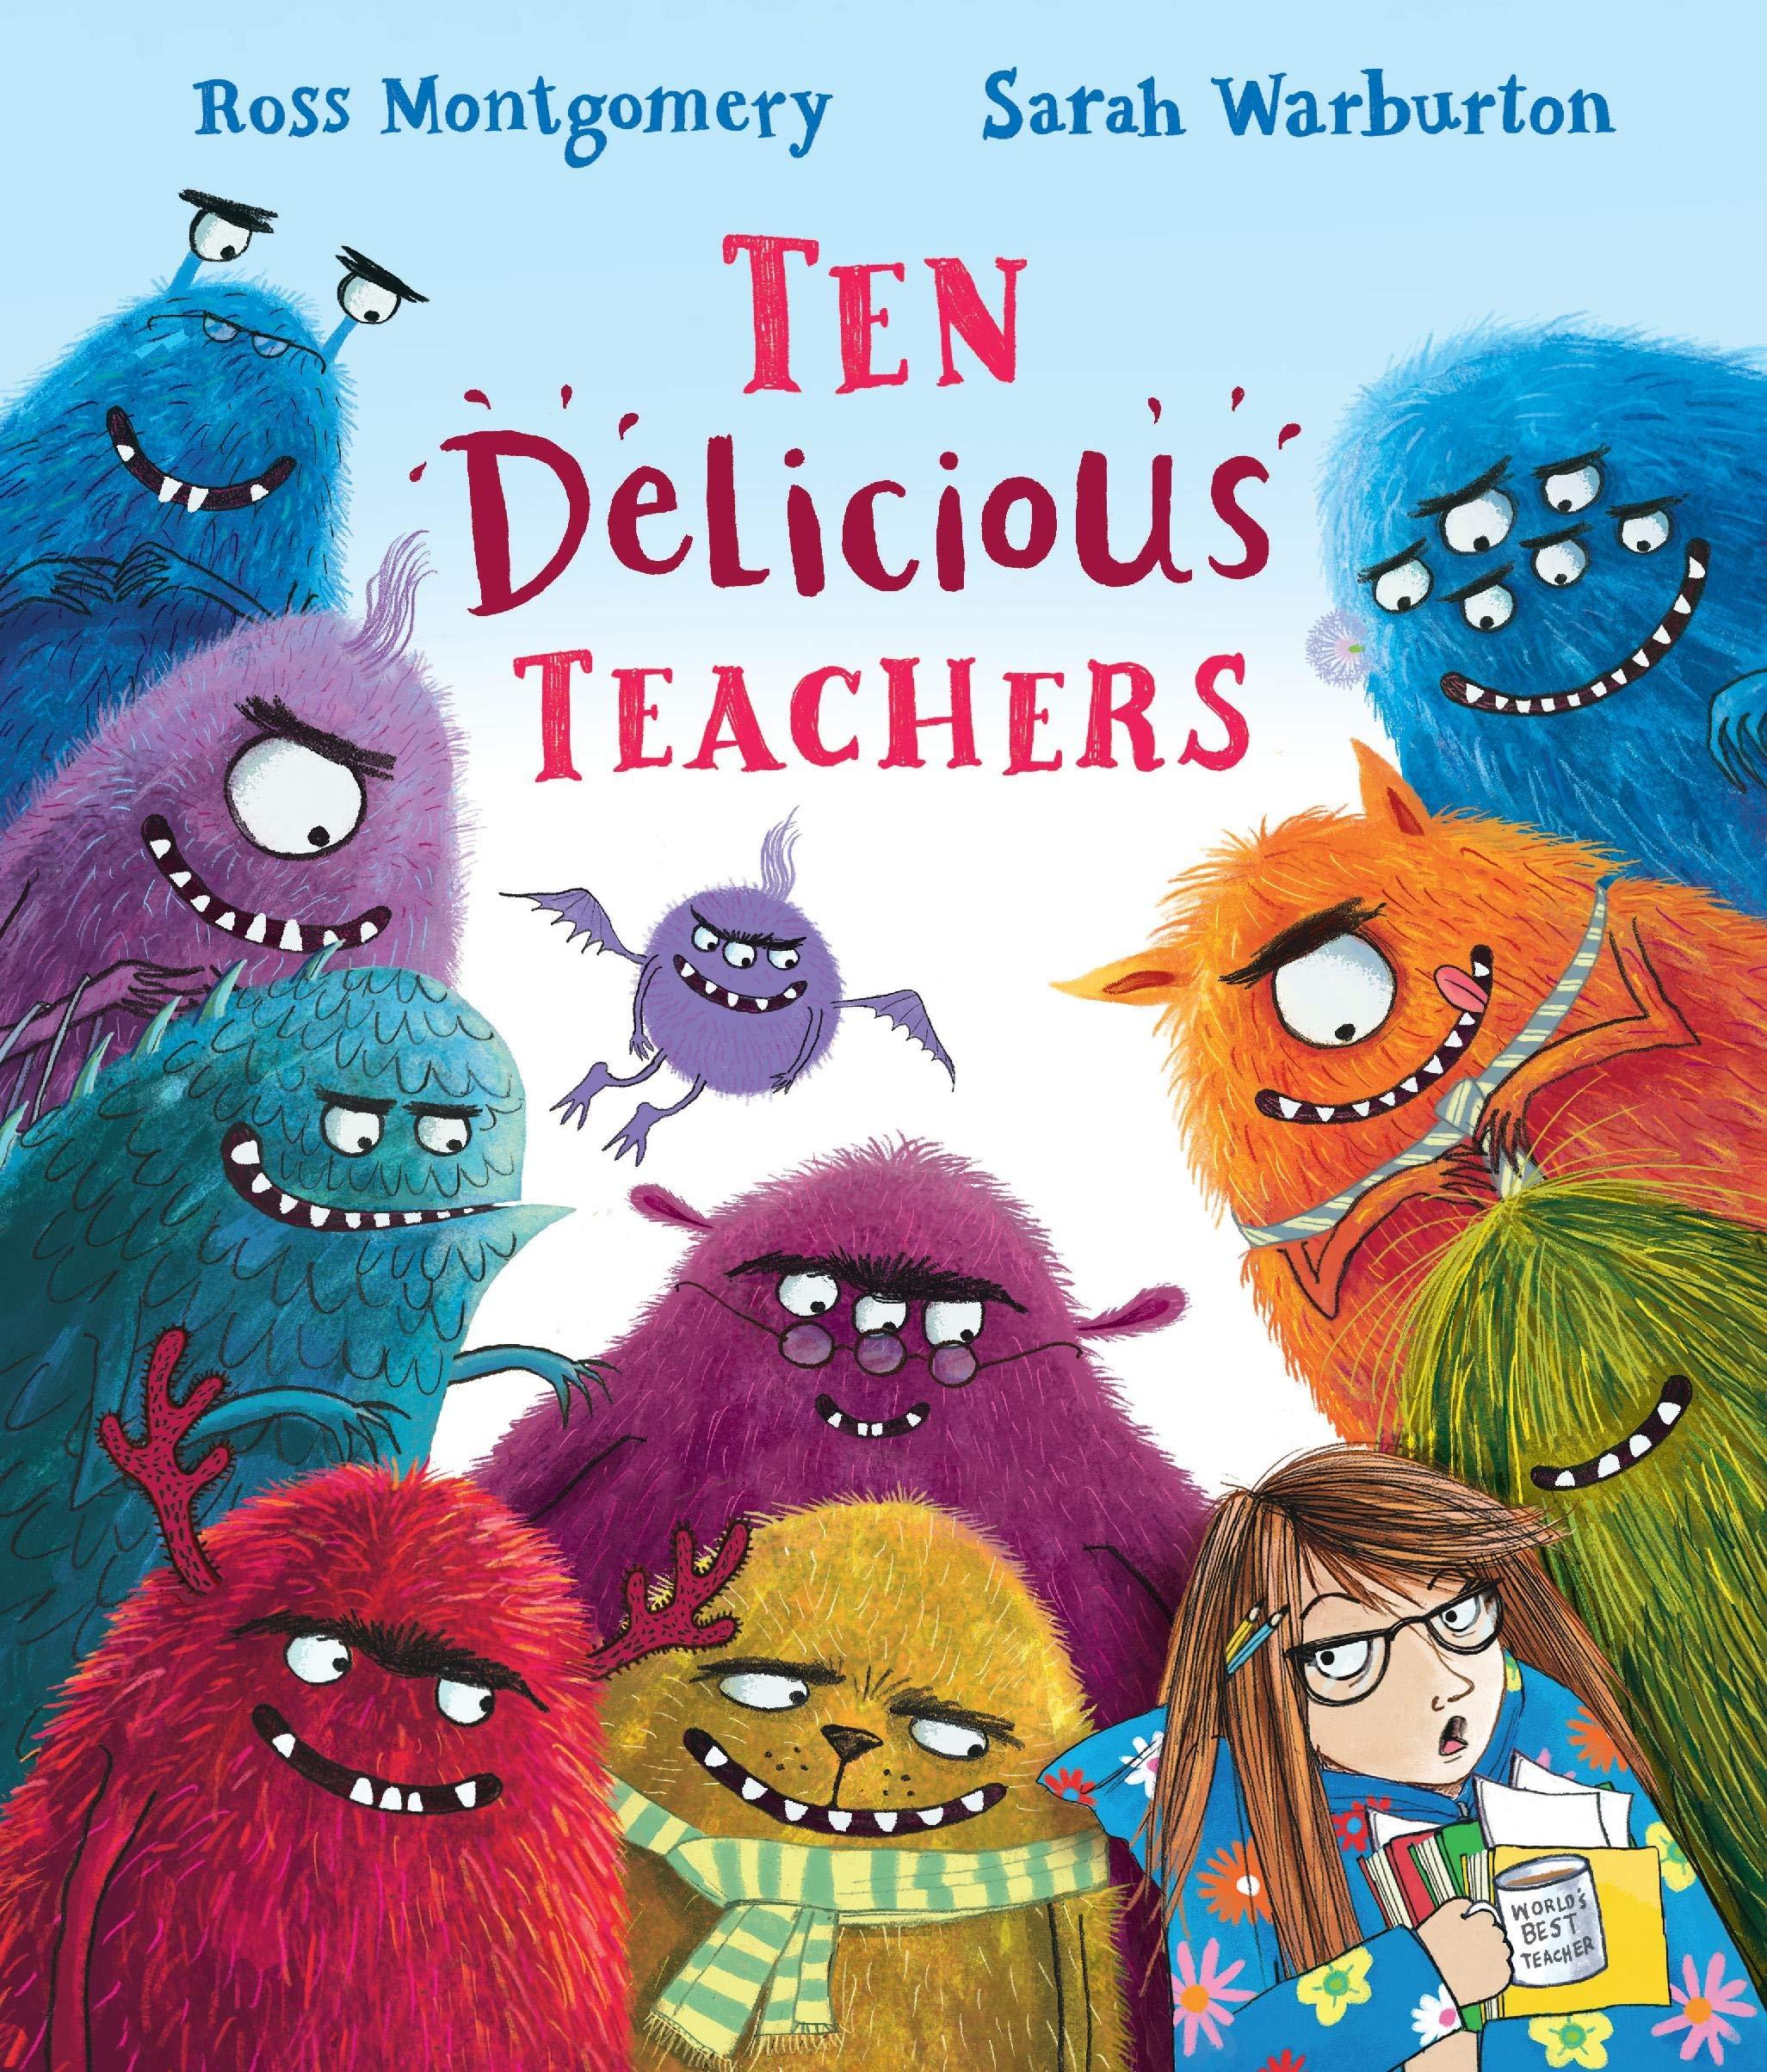 Ten Delicious Teachers : Montgomery, Ross, Warburton, Sarah: Amazon.co.uk:  Books